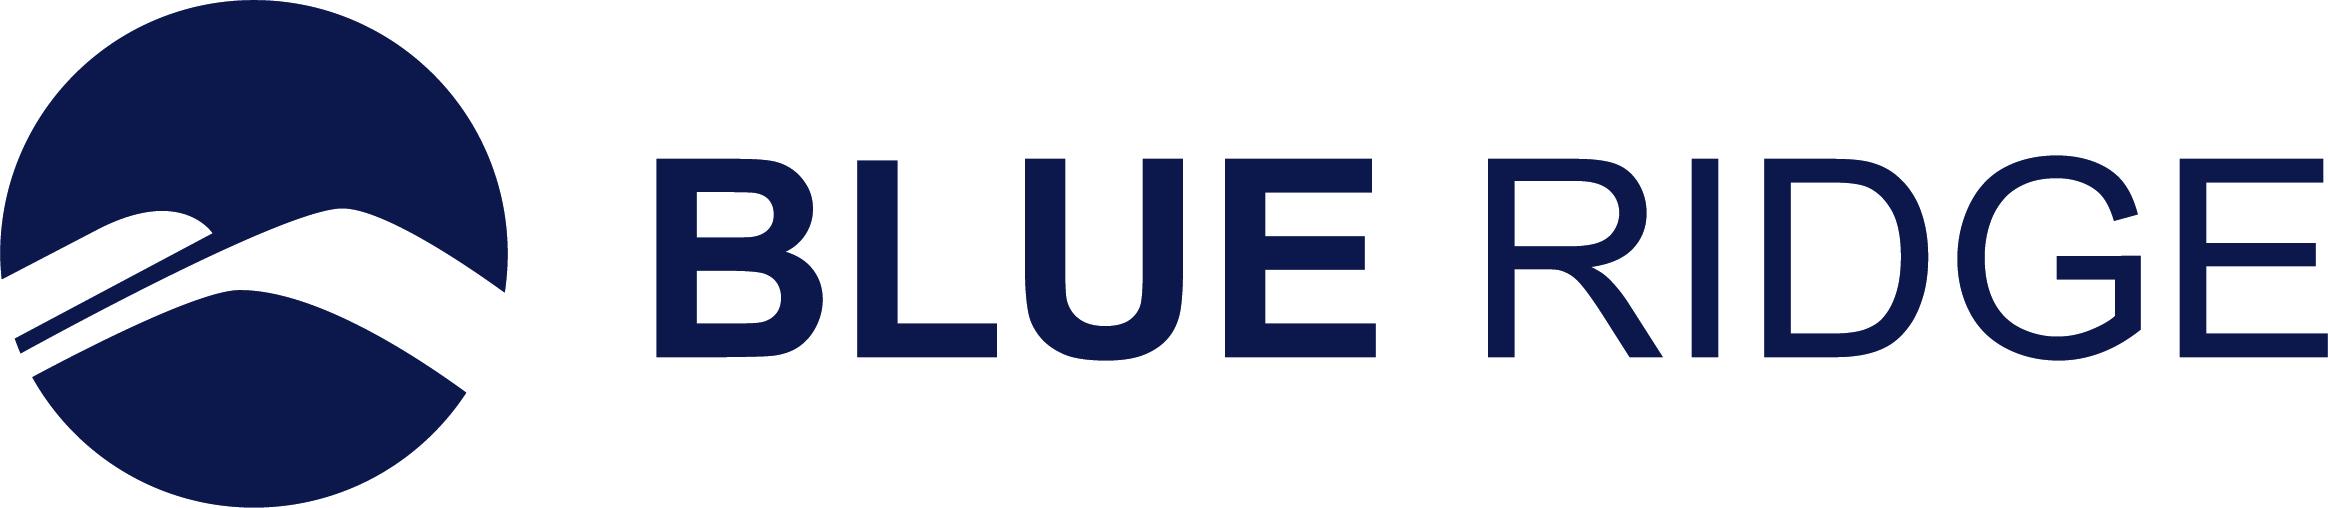 Blue Ridge's Dawn Russell, VP of Customer Experience Leads Customer Success